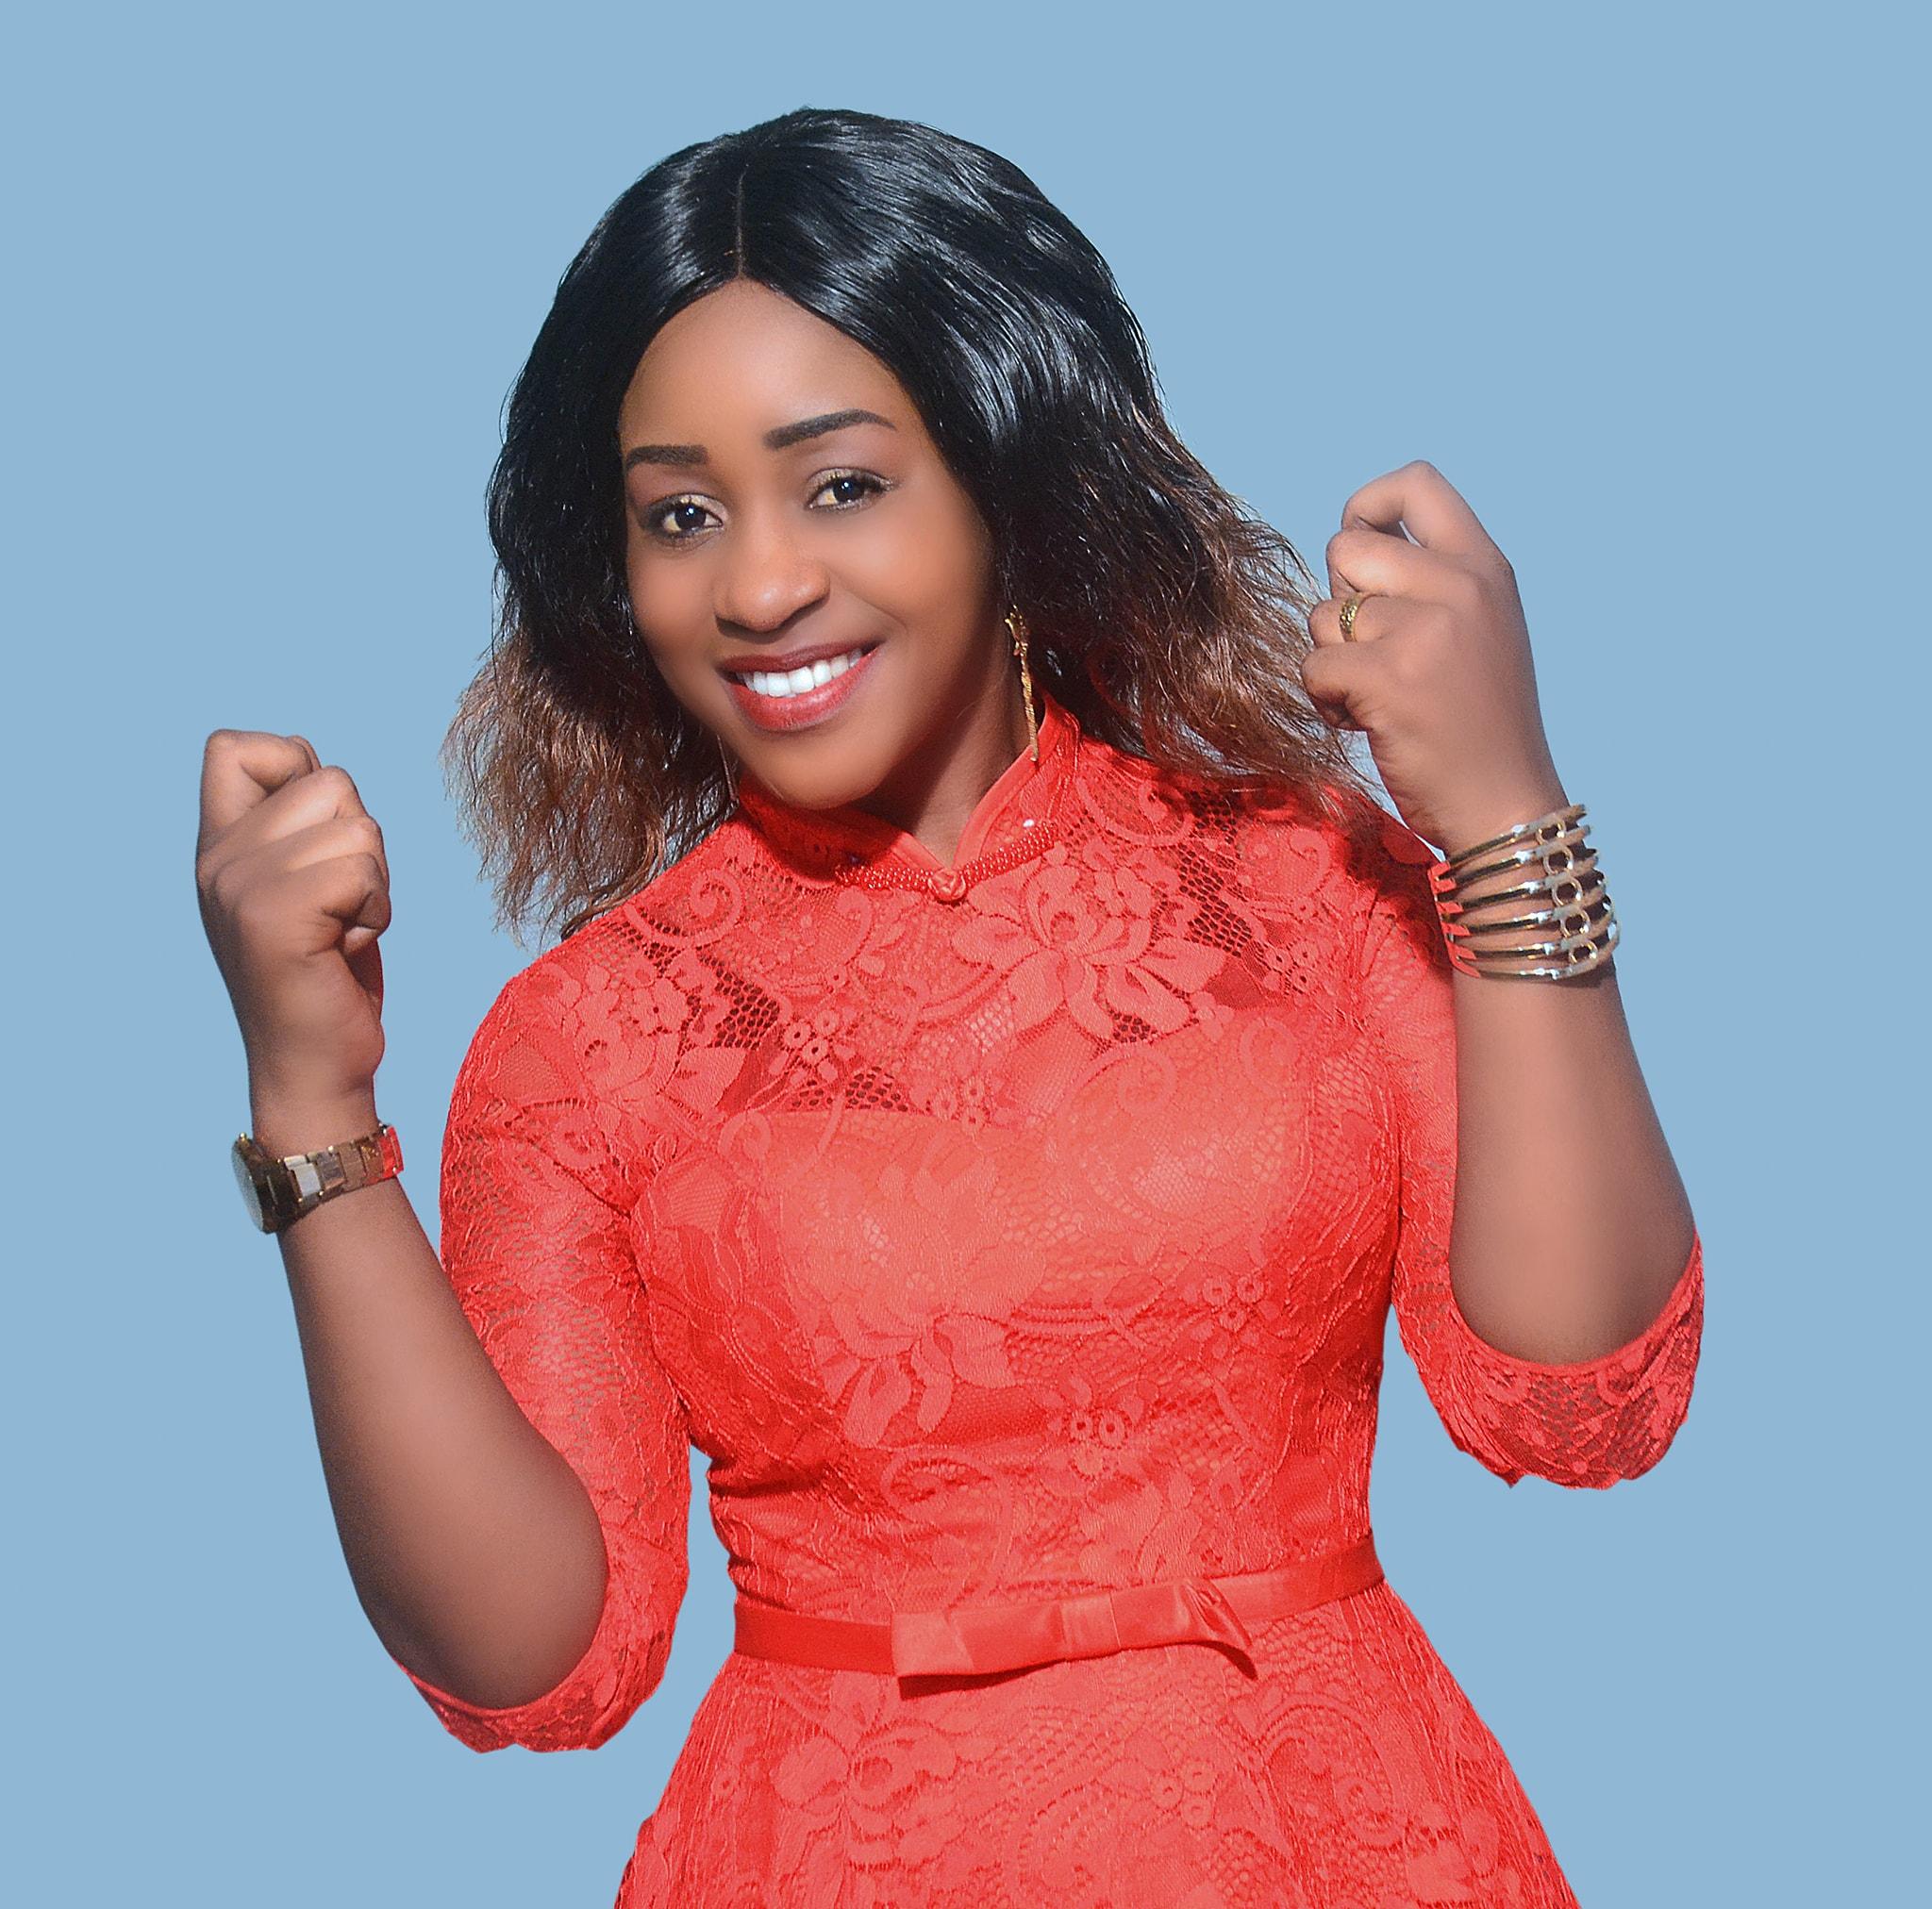 Madam Martha Ft Chidumule - Mungu hana Upendeleo | Download mp3 audio.